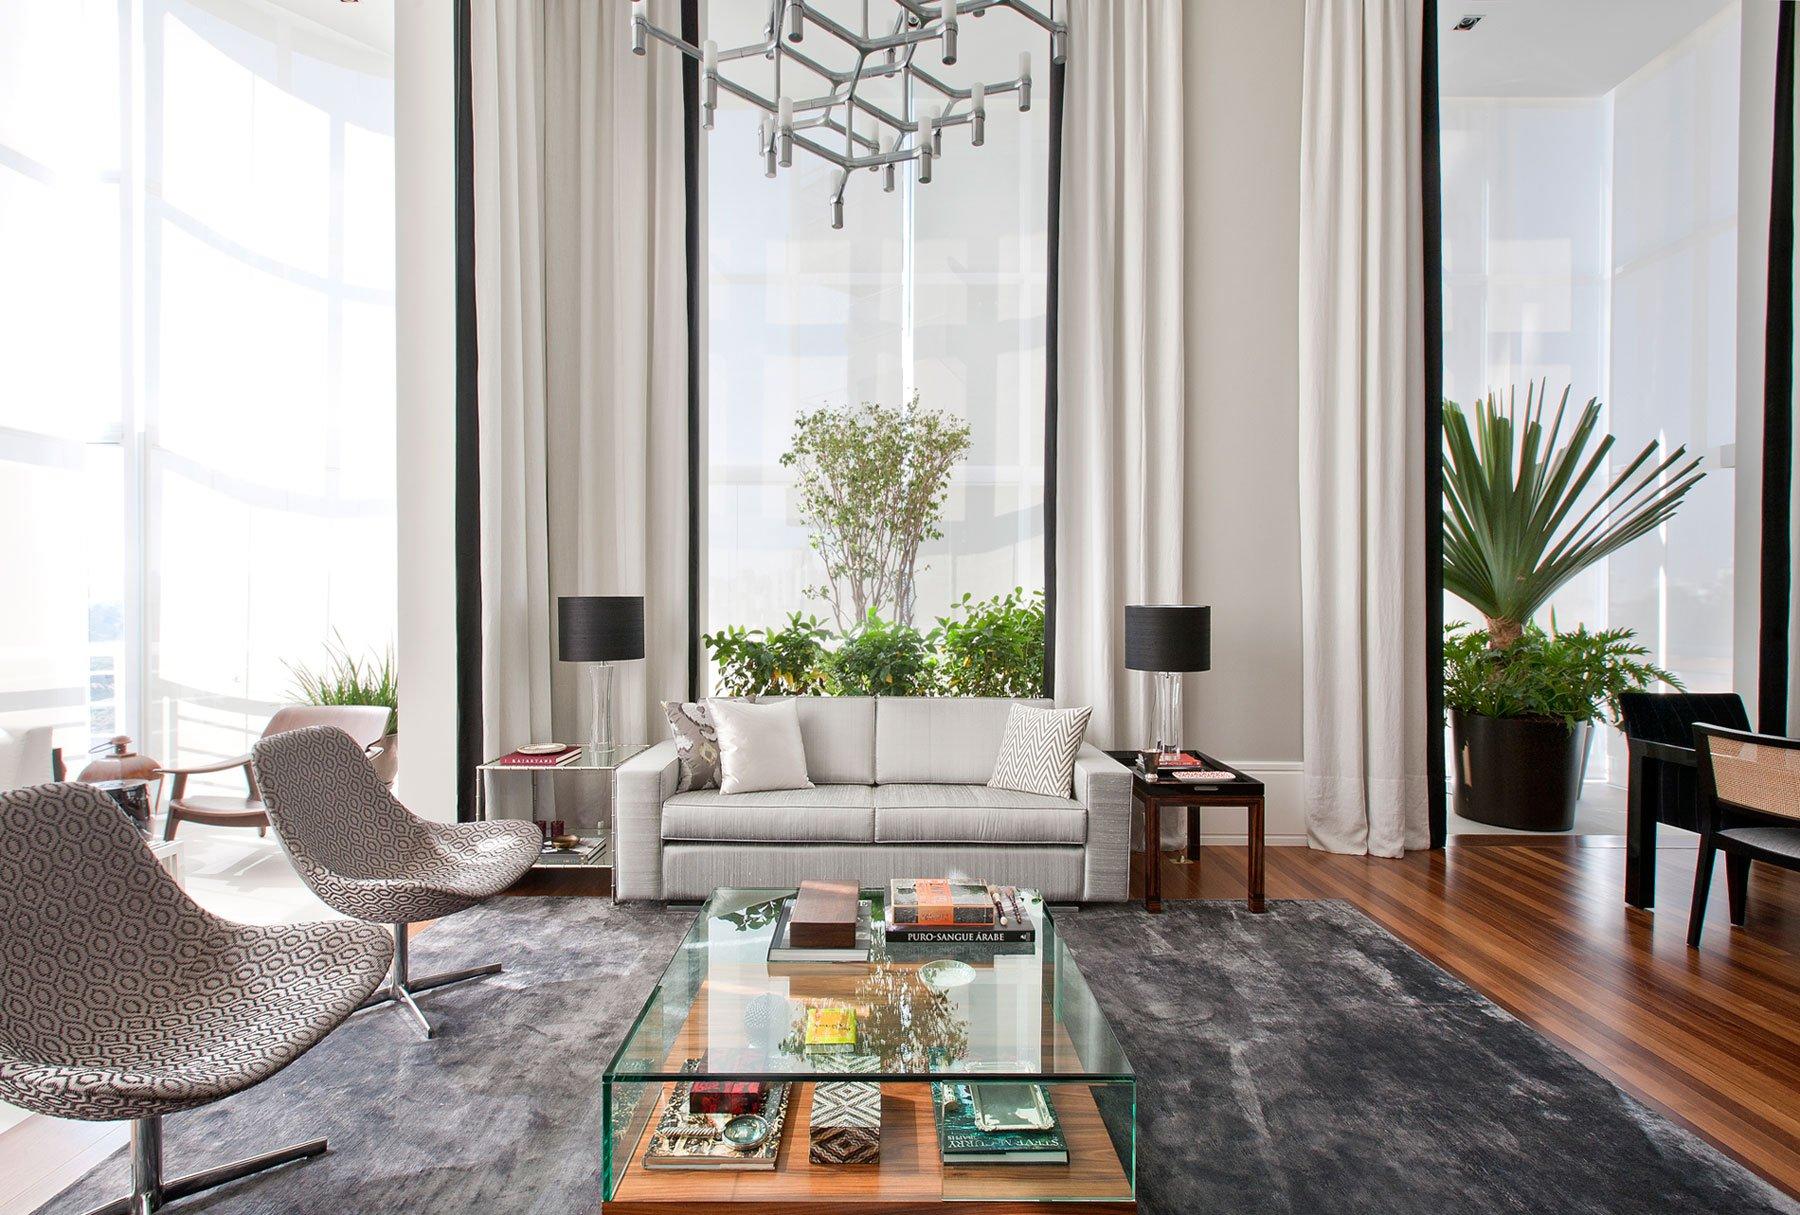 Elegant Home Interior By Marcelo Mota Arquitetura